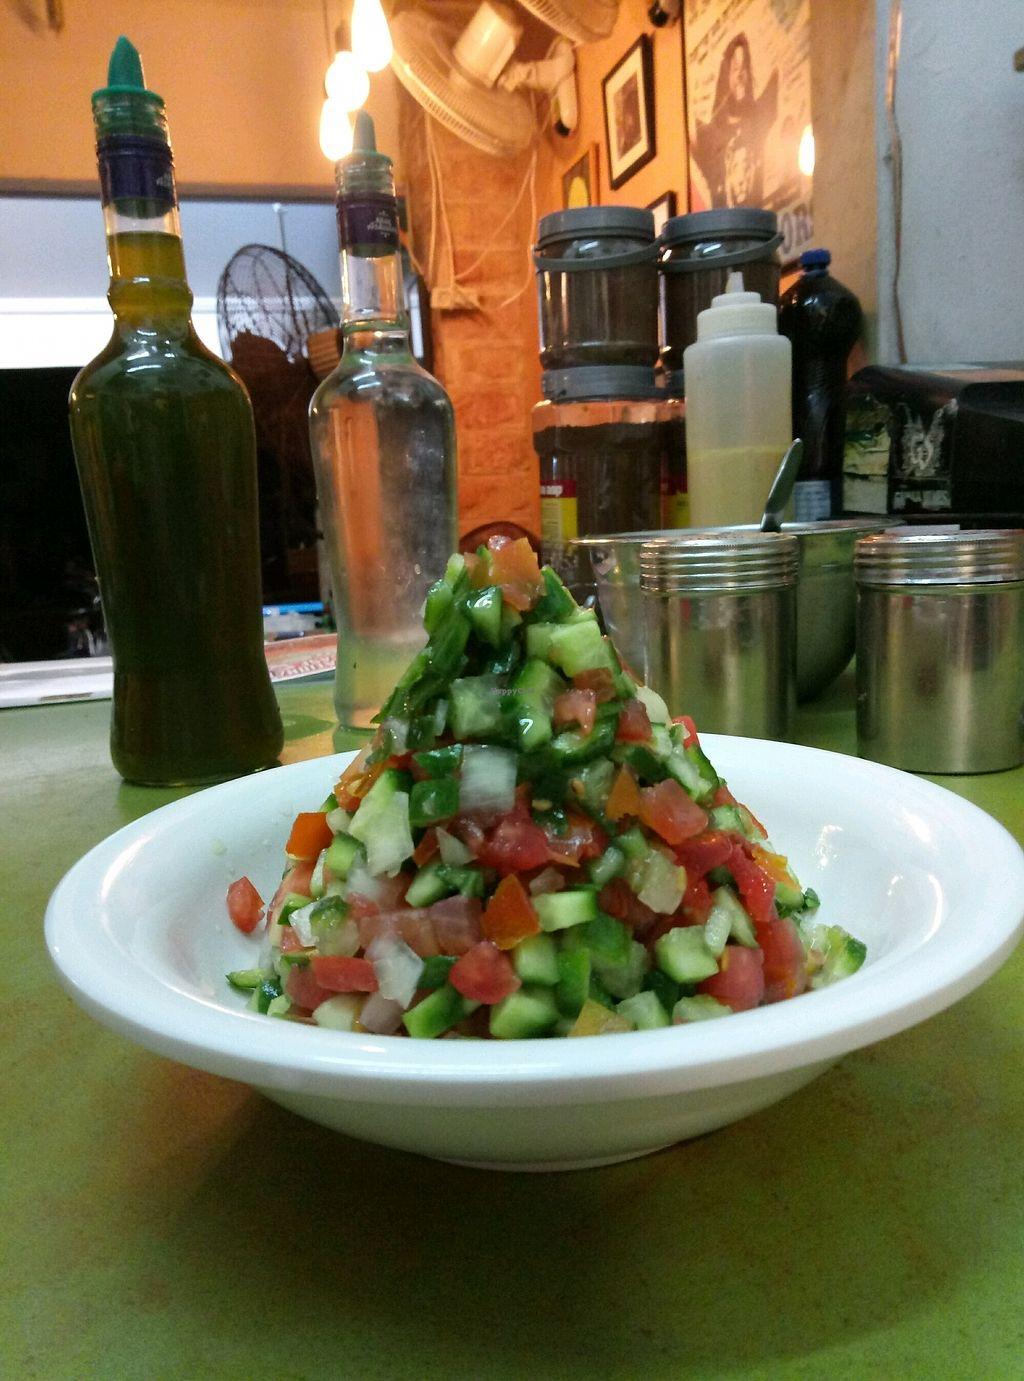 "Photo of Abu Dubi Hummus  by <a href=""/members/profile/AssafVNoam"">AssafVNoam</a> <br/>fresh salad <br/> November 7, 2017  - <a href='/contact/abuse/image/30415/322977'>Report</a>"